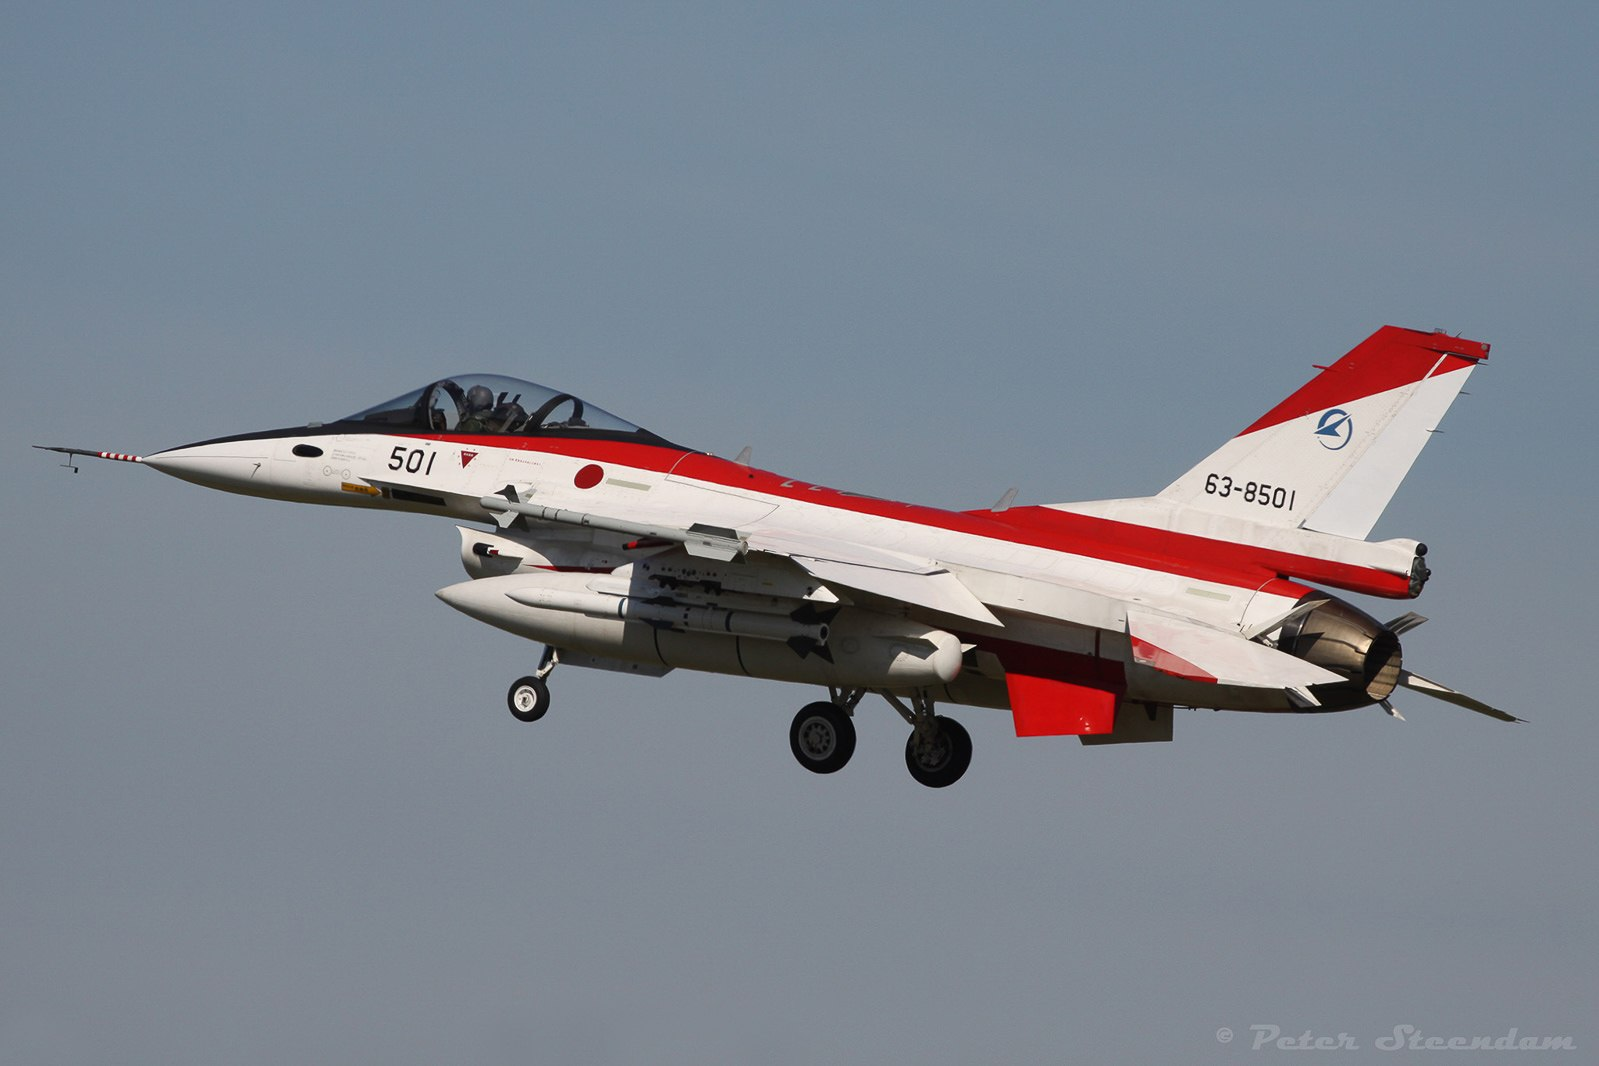 f-2a-63-8501-hkj-landing_mod_fb